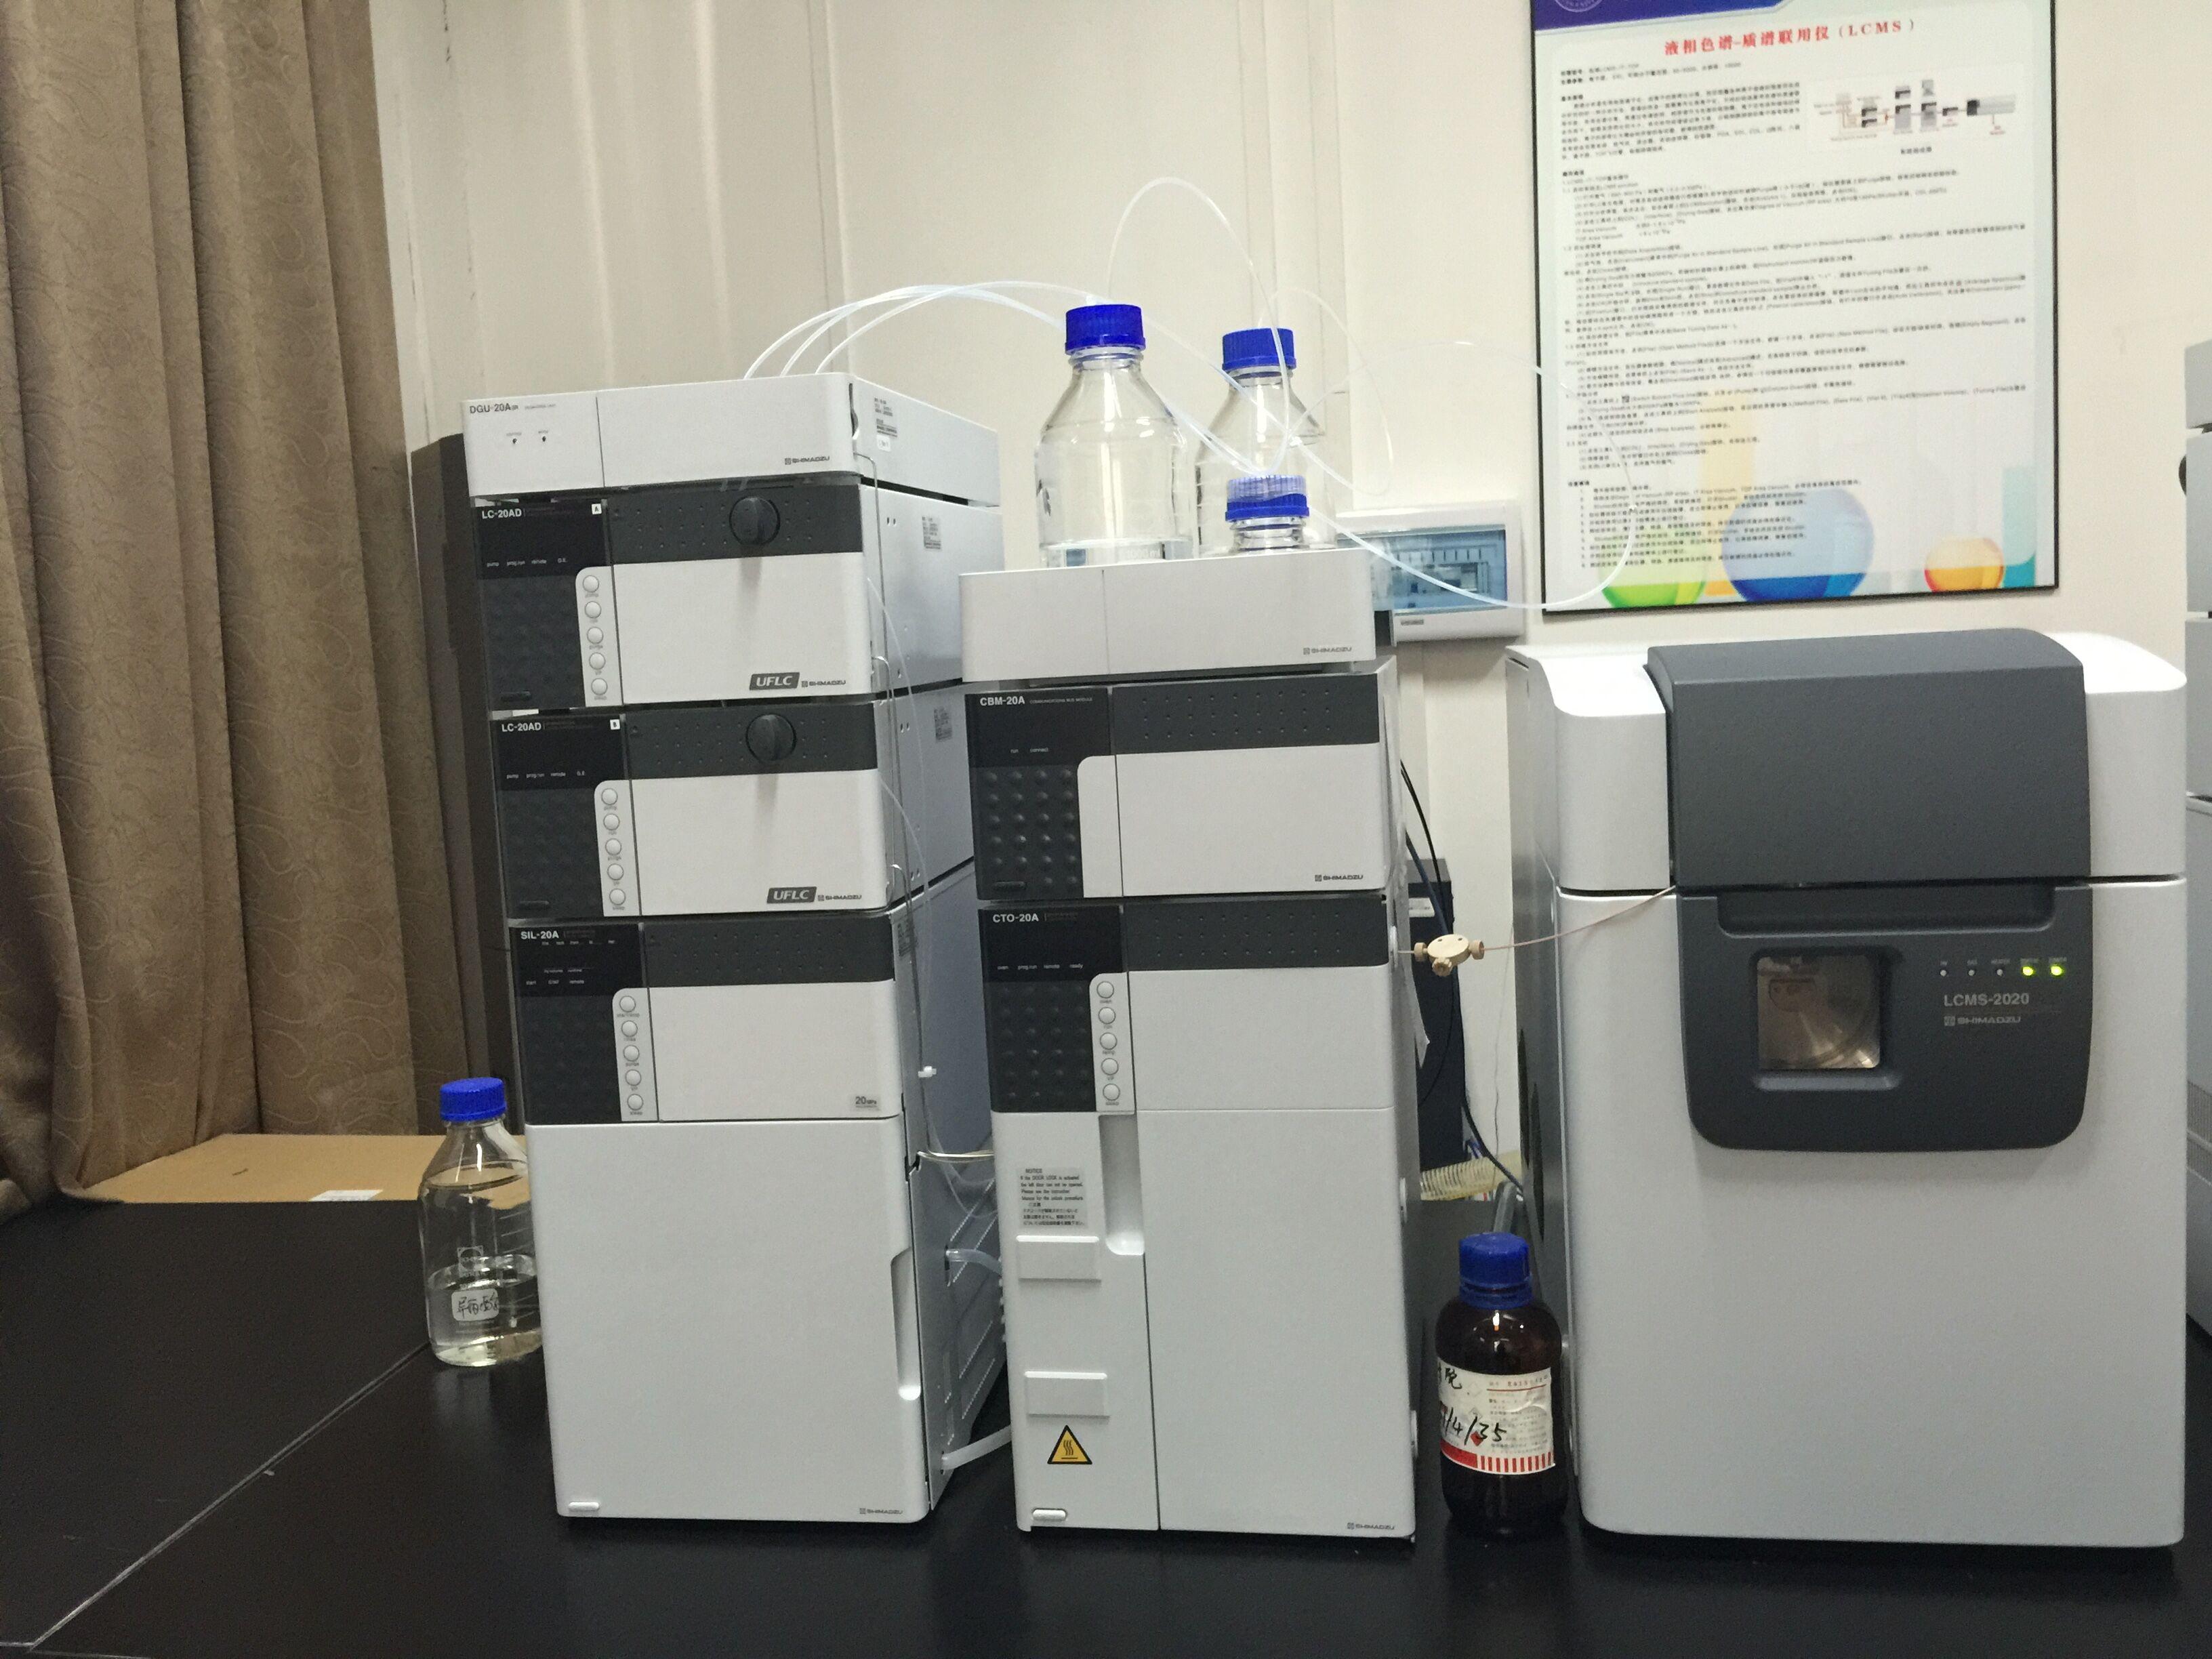 低分辨液相色谱质谱联用仪(Lower Resolution Liquid Chromatograp)